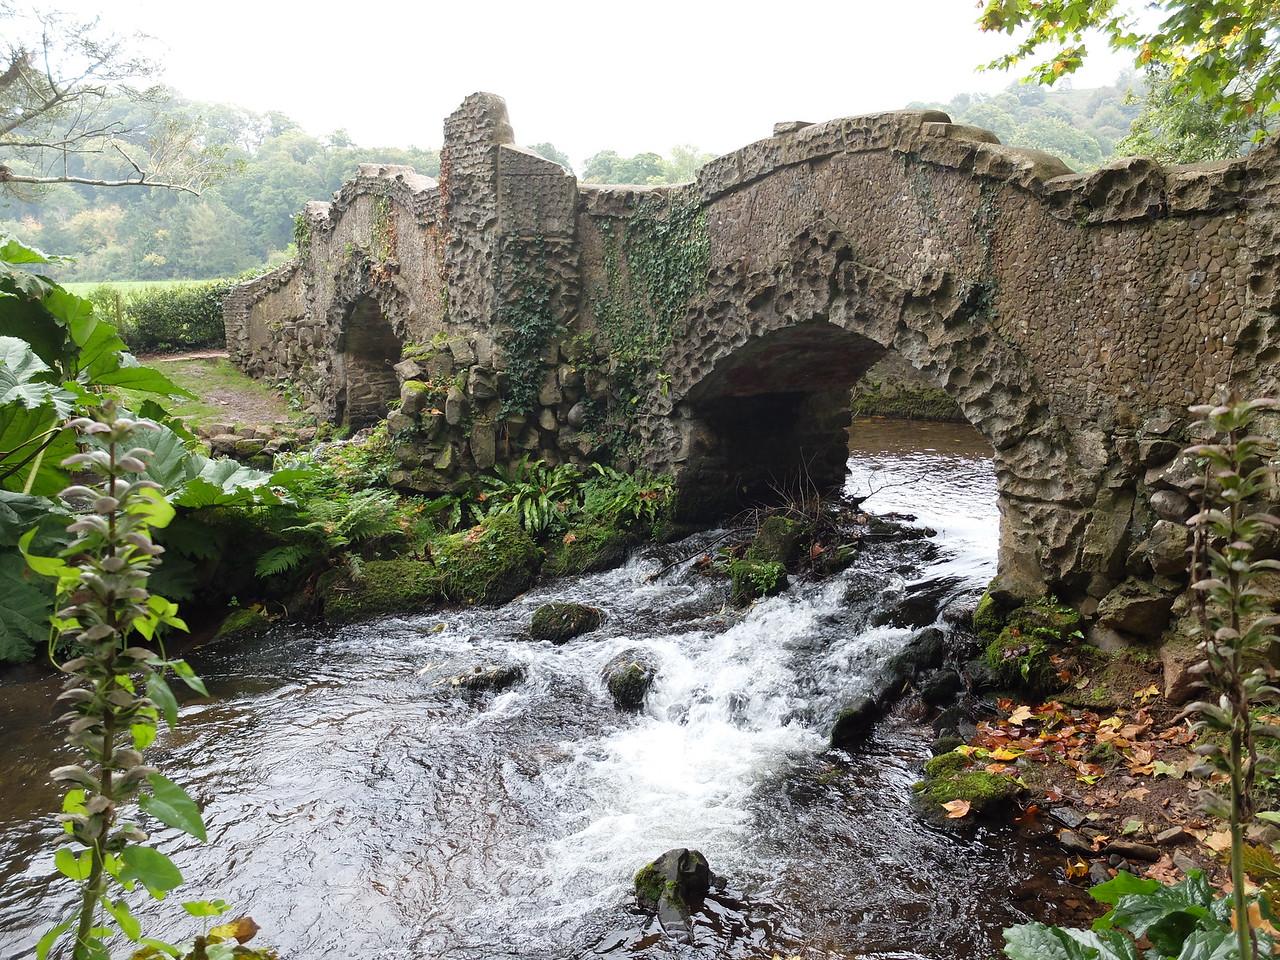 Lovers' Bridge at Dunster Castle